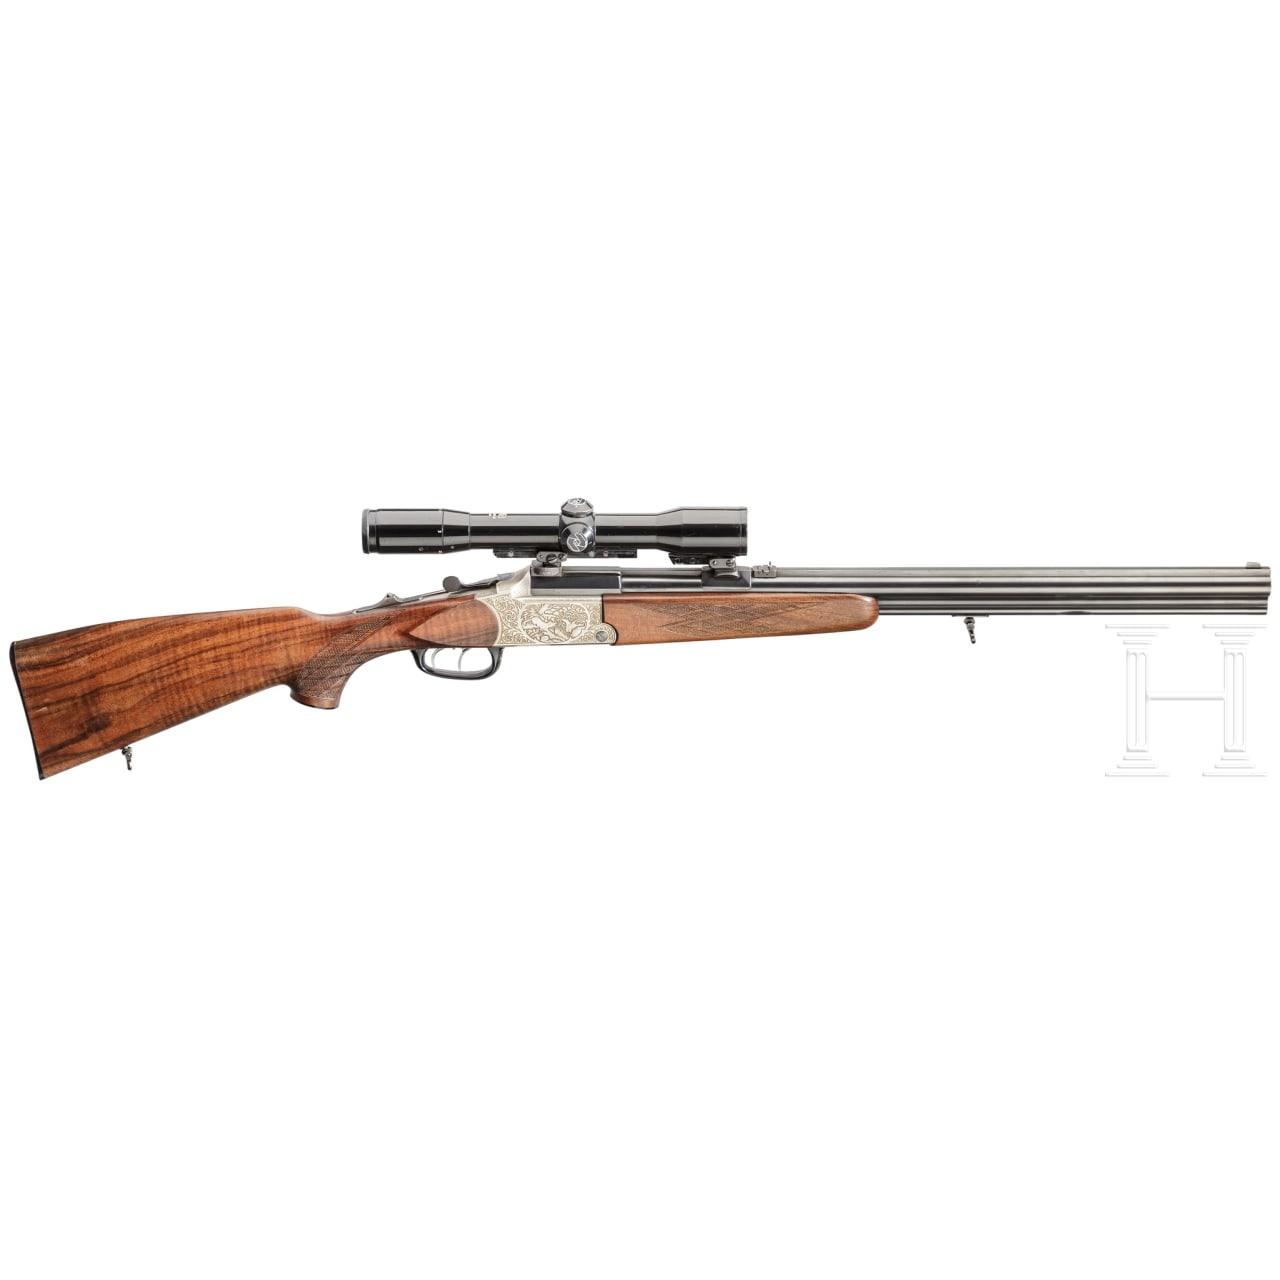 A Blaser rifle-shotgun with Zeiss scope and insert barrel